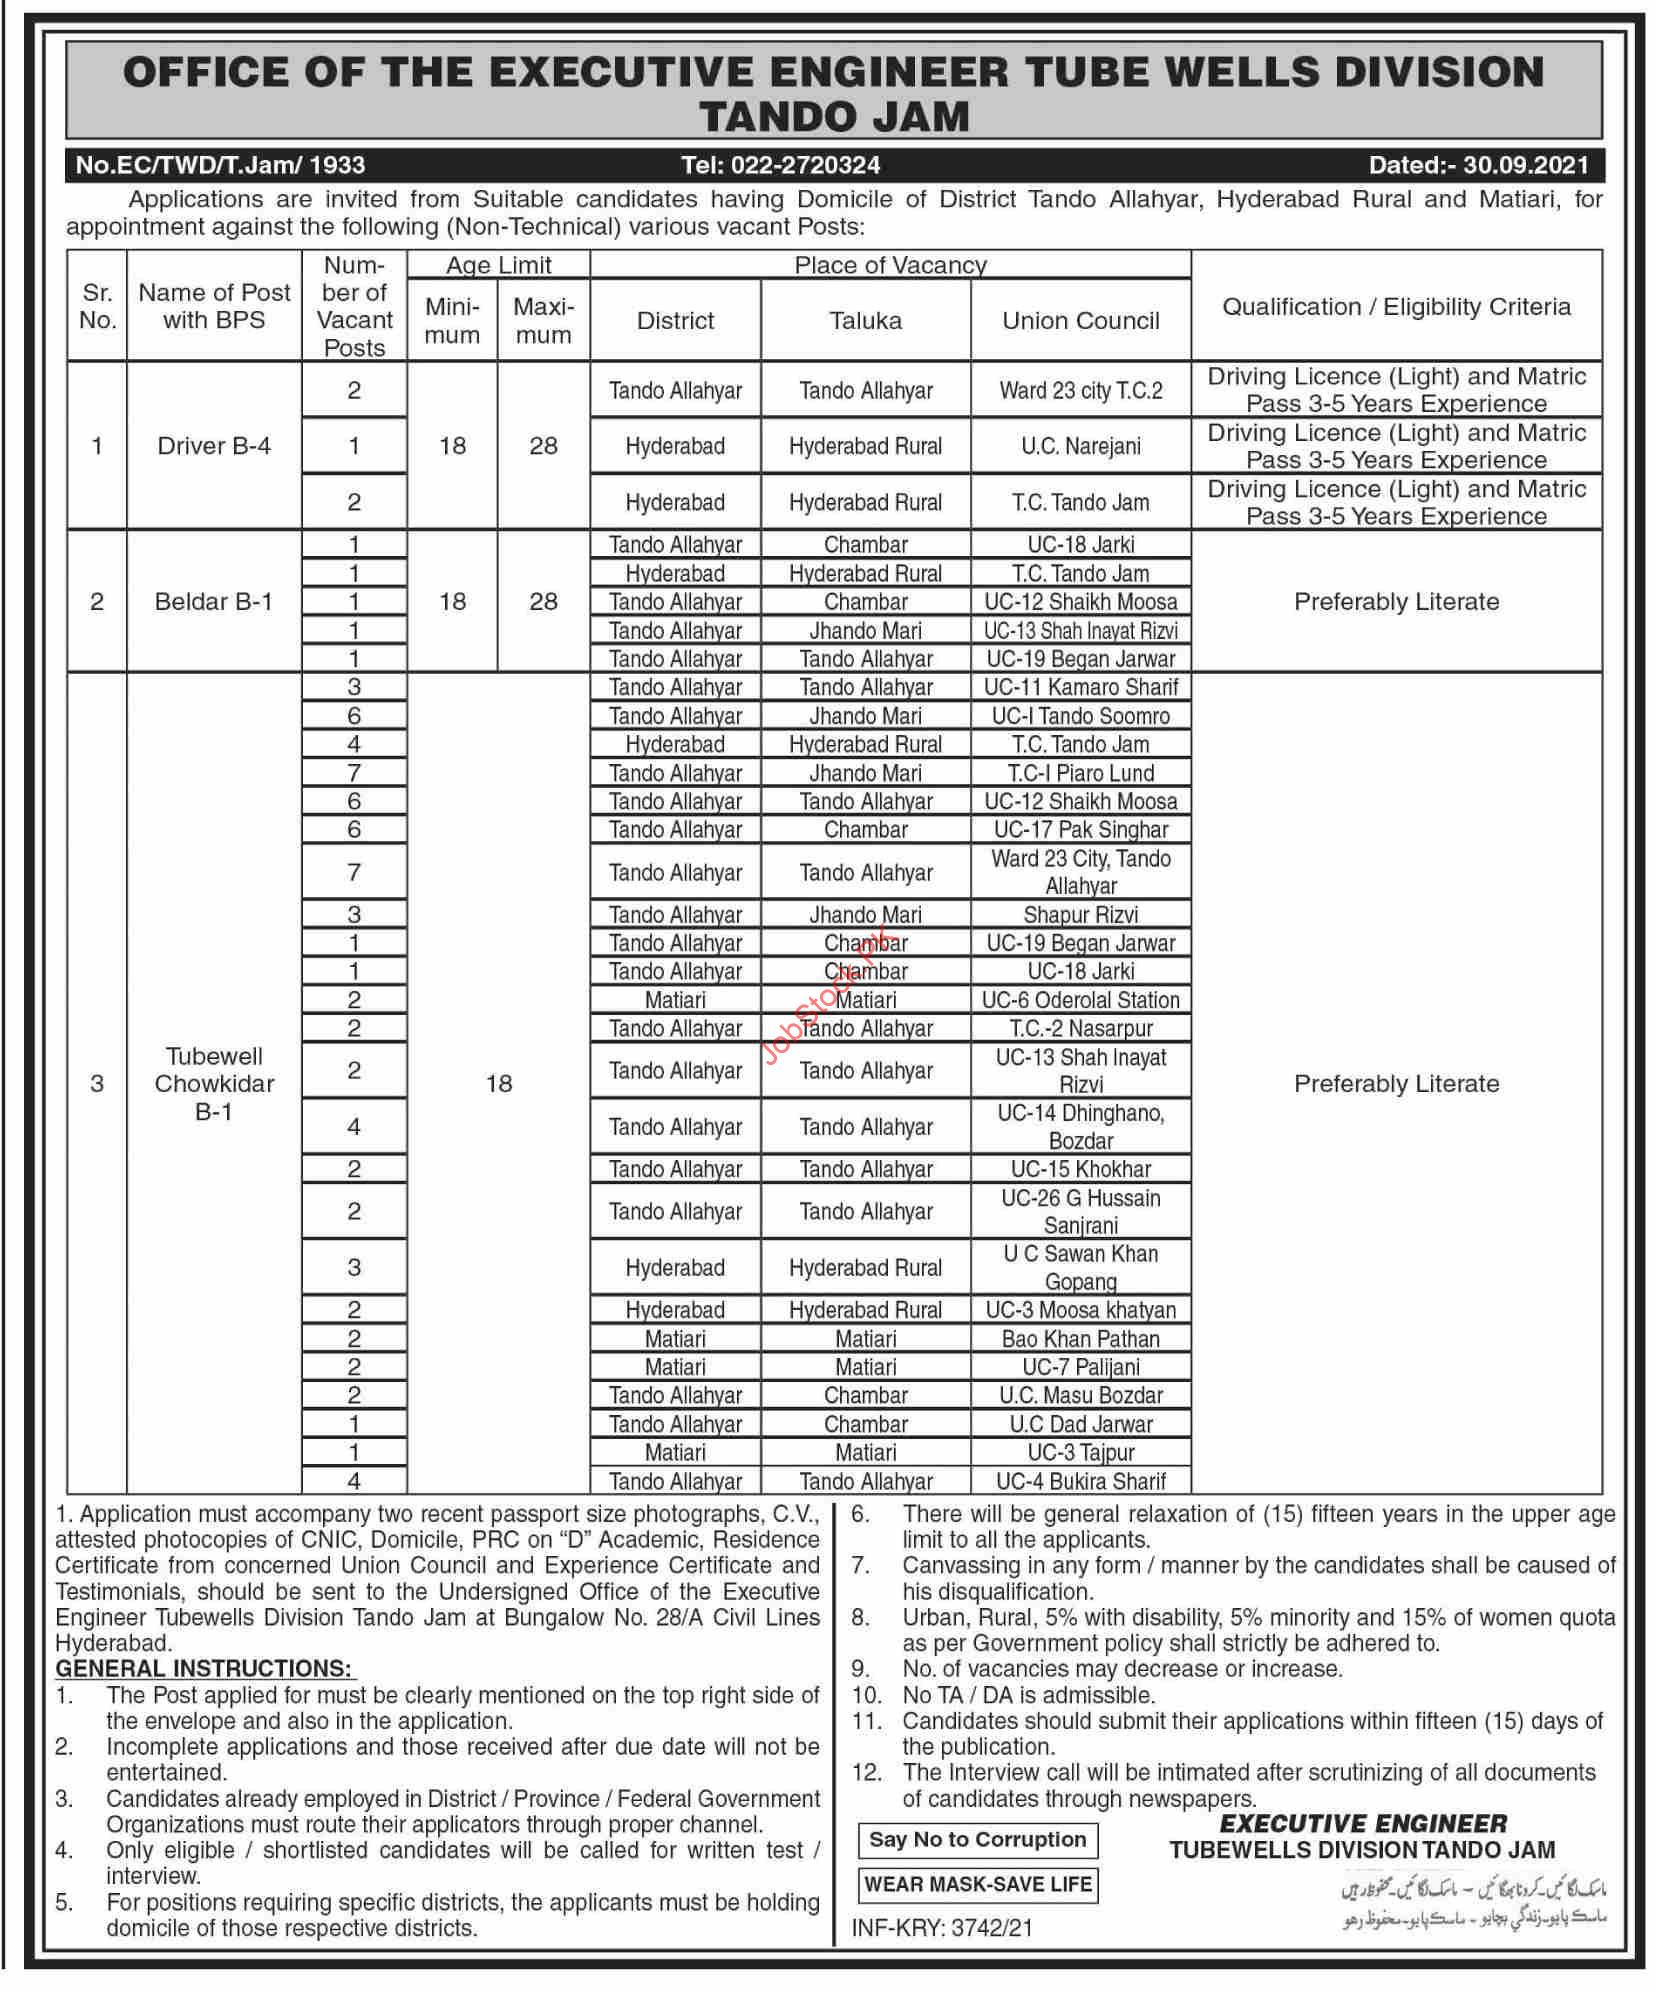 sindh irrigation department jobs 2021 Advertisement